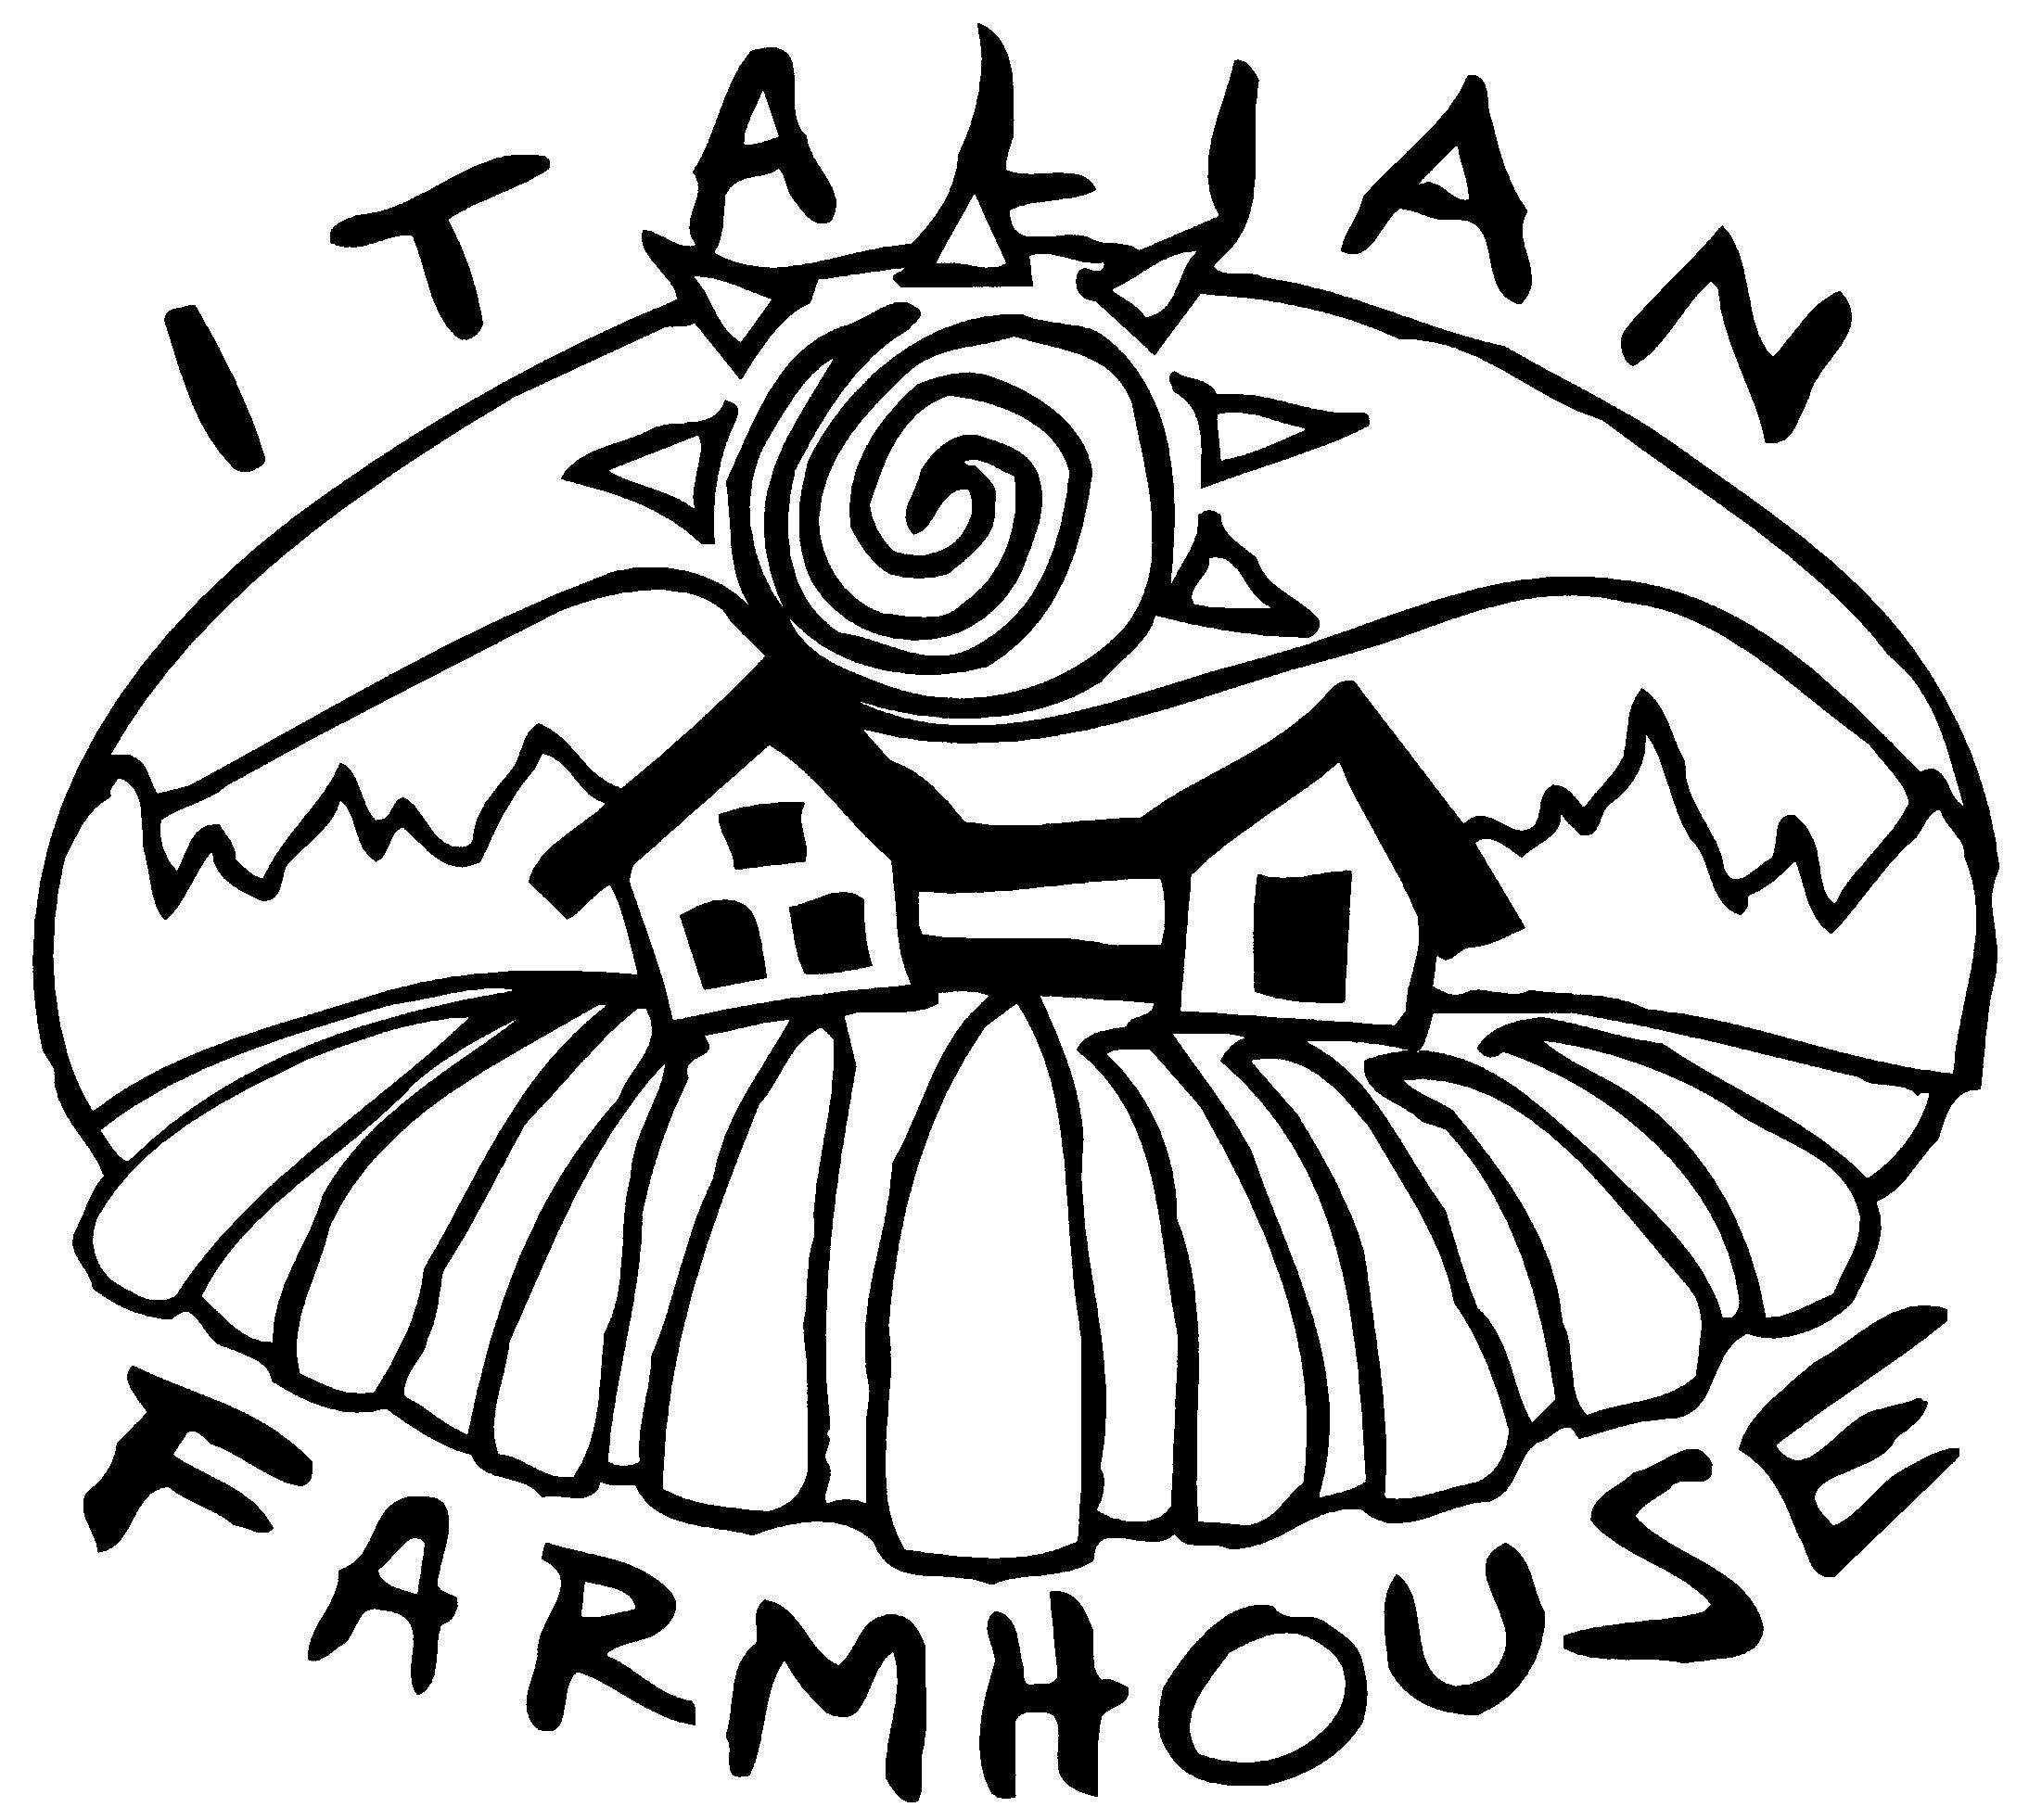 Italian Farmhouse in Plymouth, NH http://www.restaurantweeknh.com ...